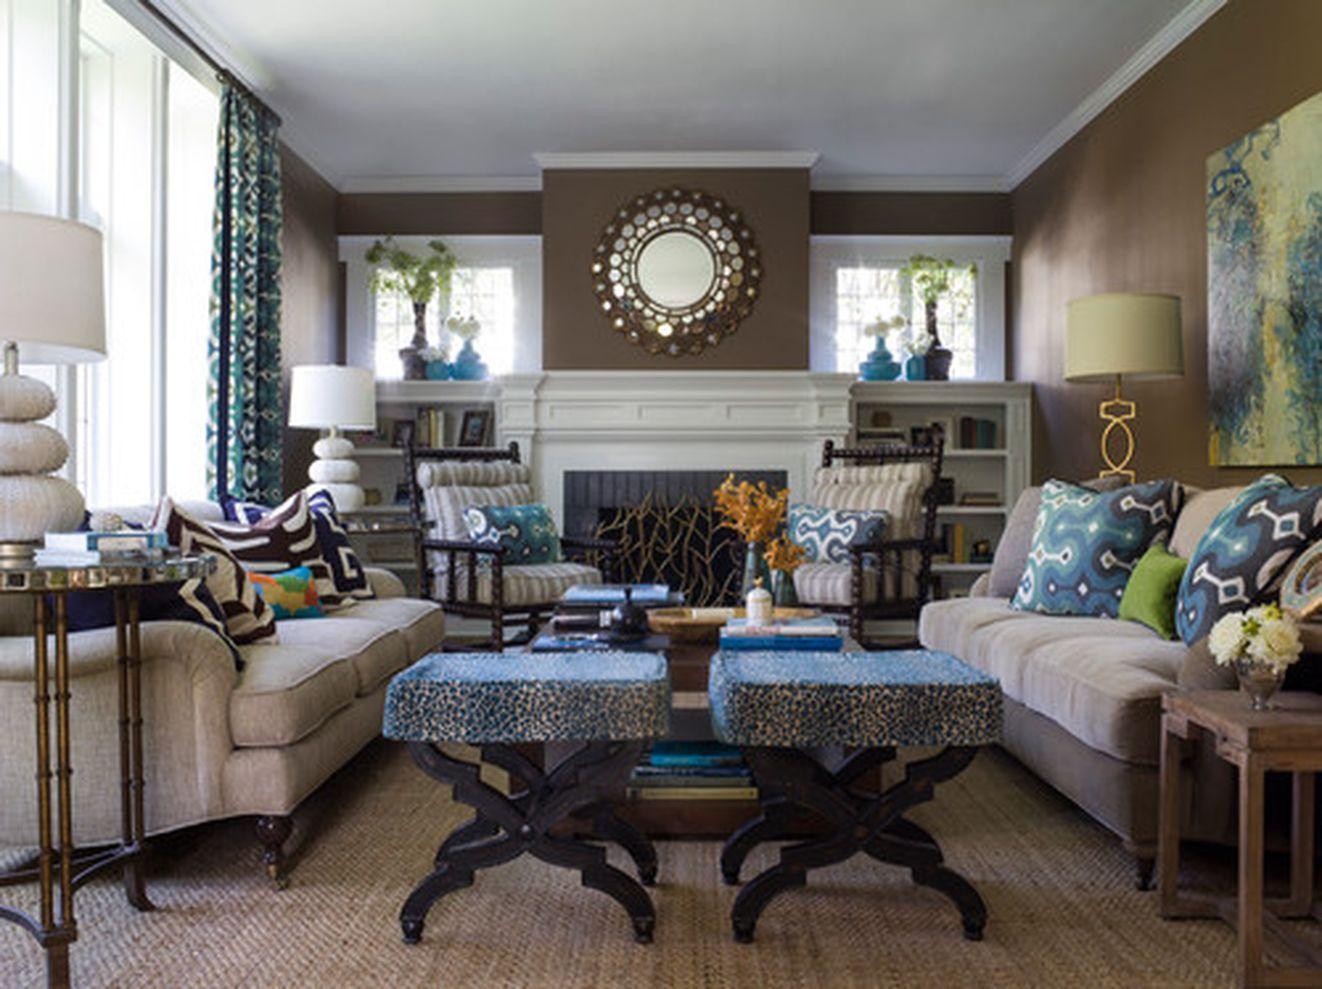 beautiful long narrow living room ideas 23 round decor. Black Bedroom Furniture Sets. Home Design Ideas